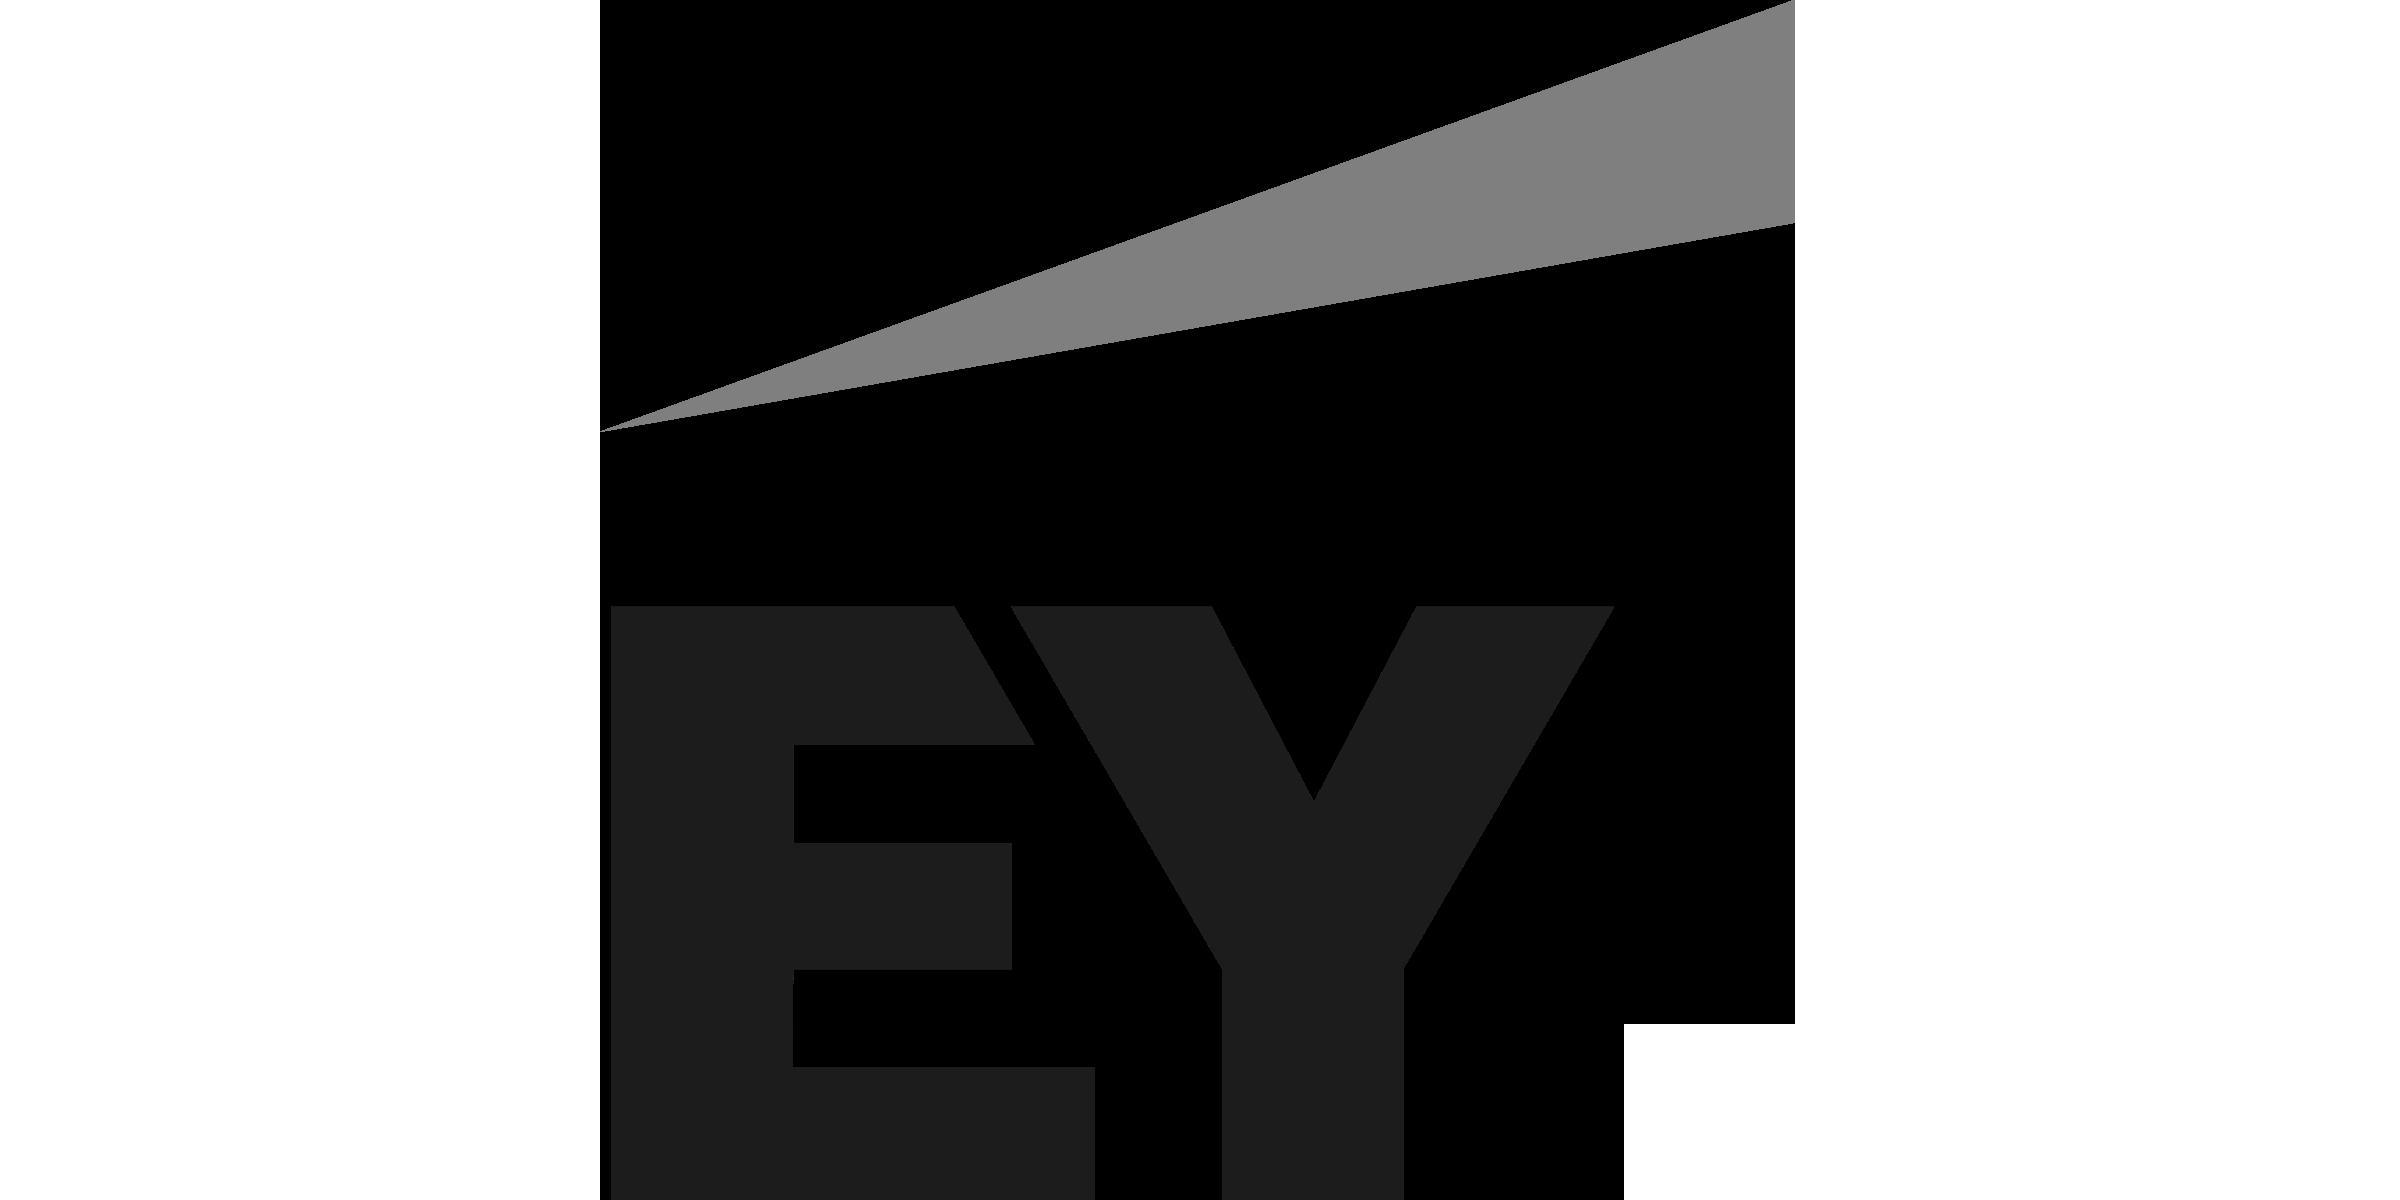 Ernst & Young logo